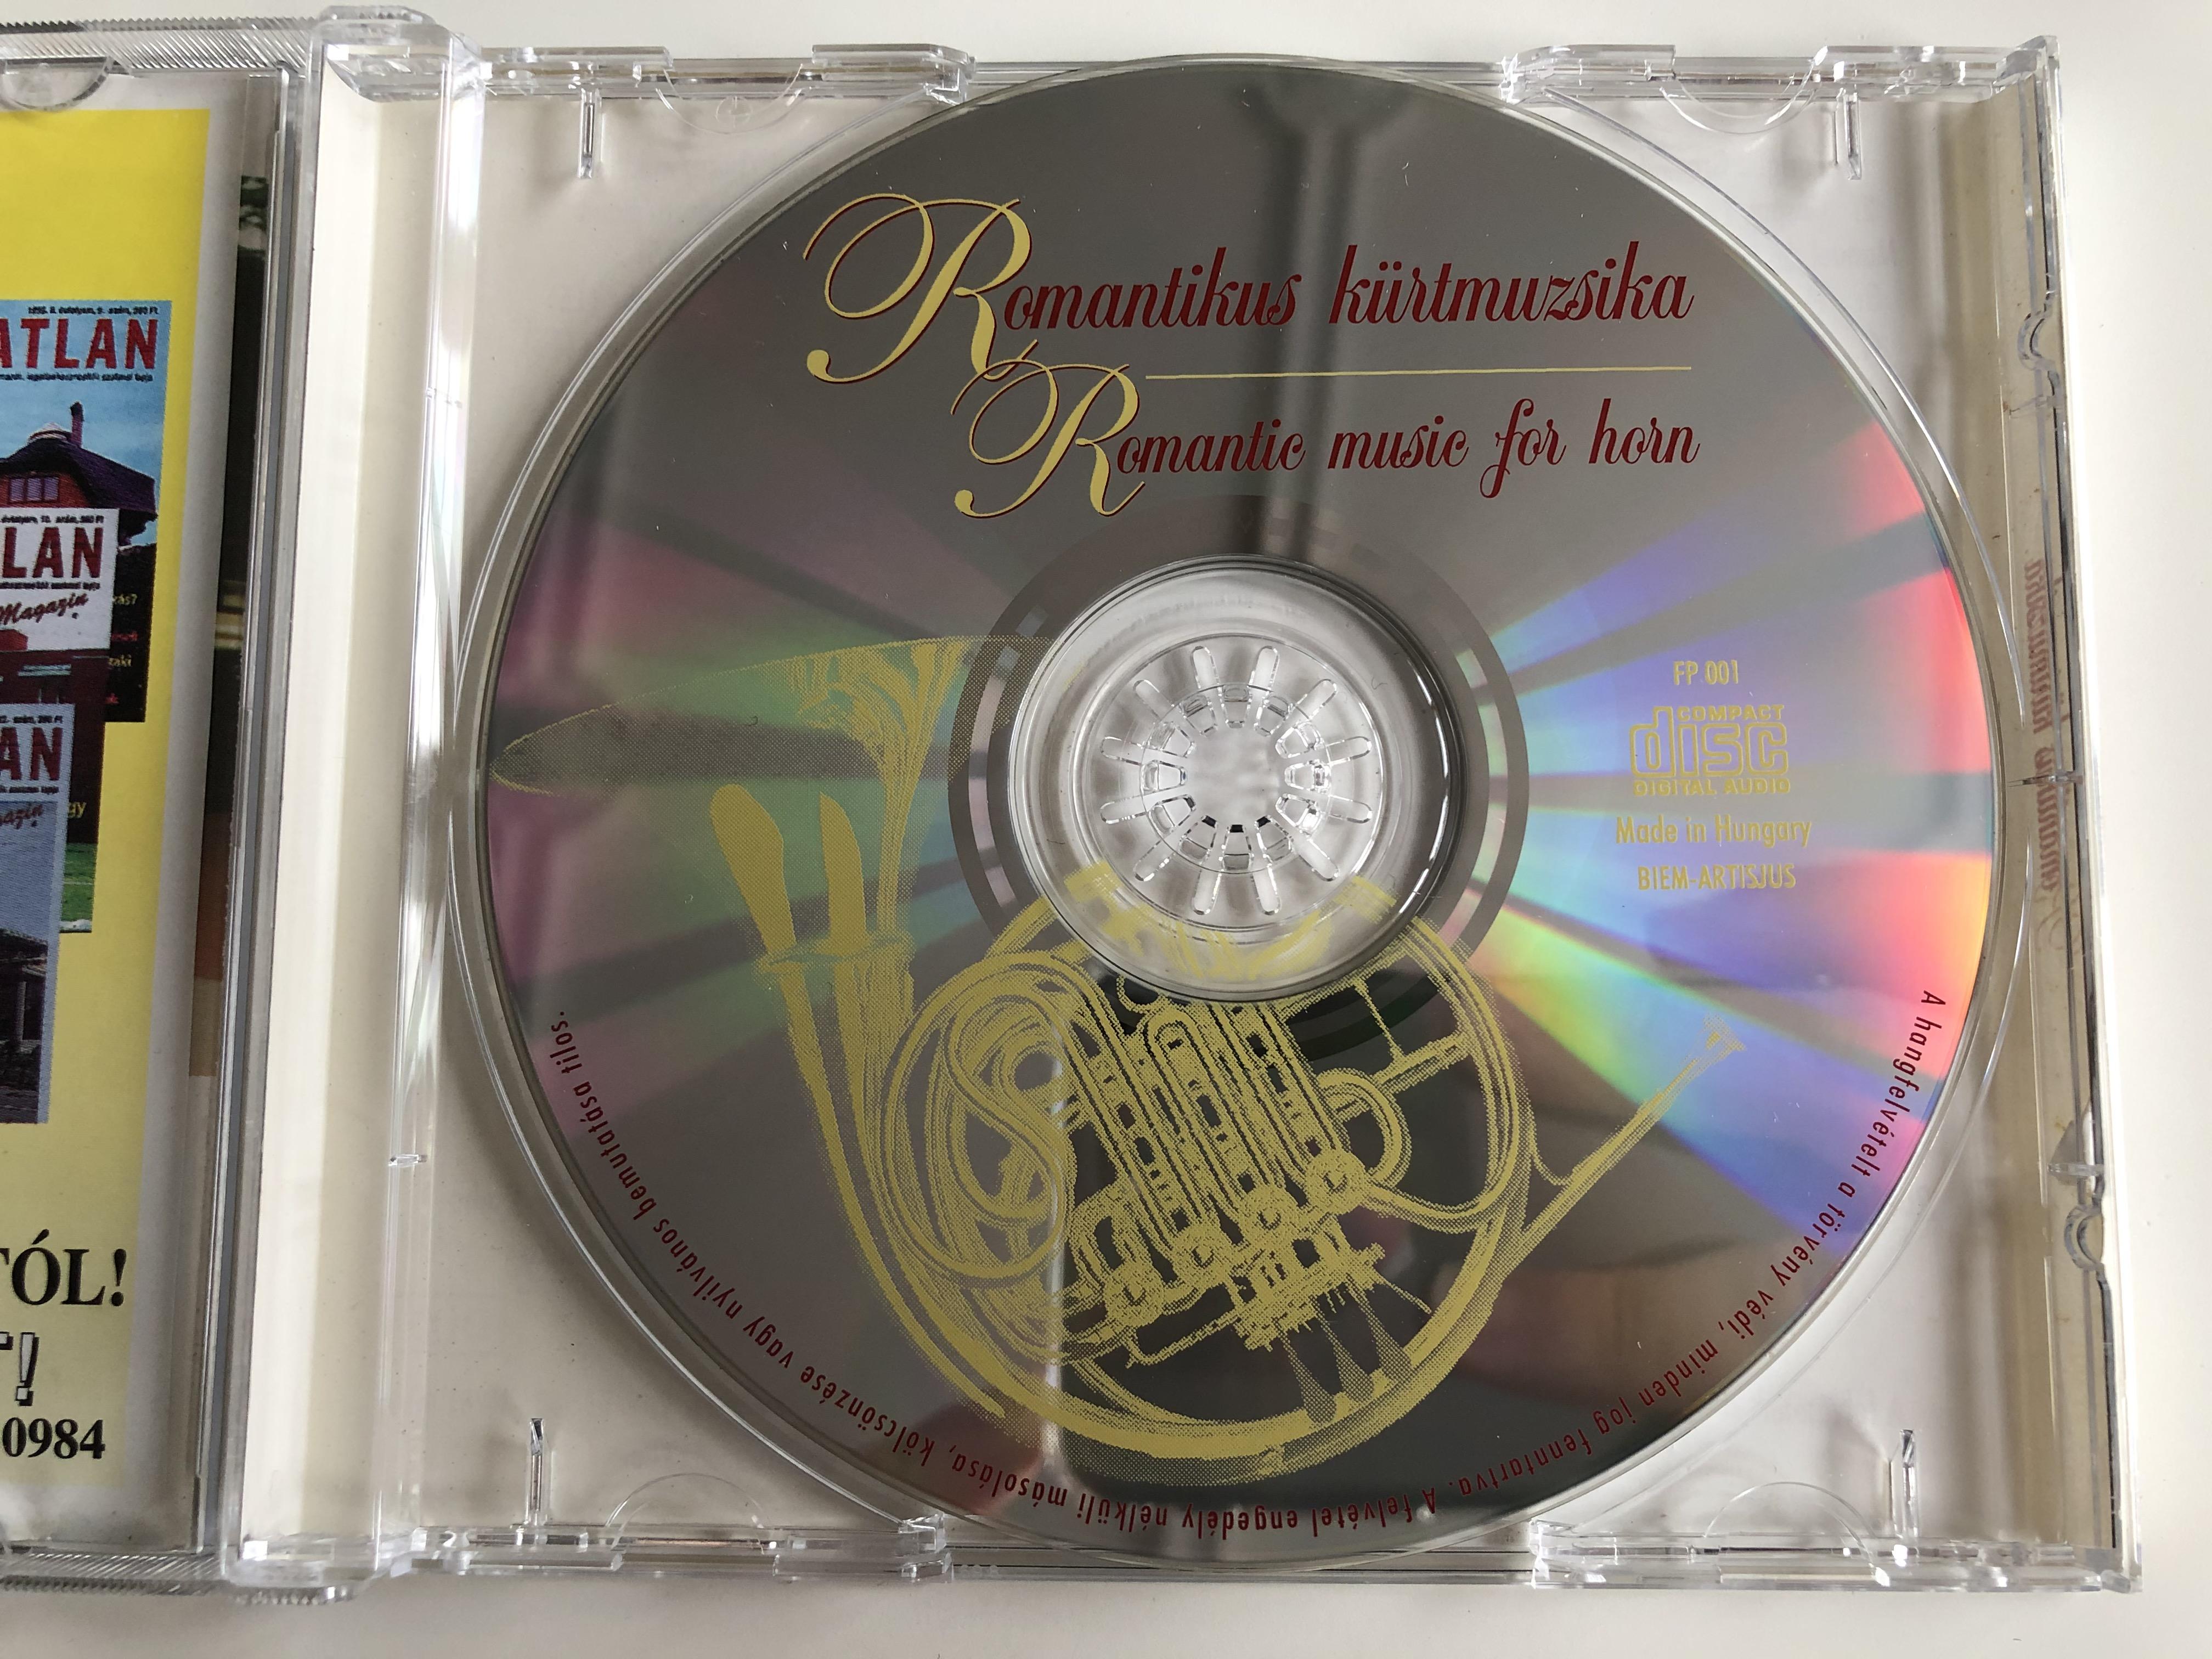 romantikus-k-rtmuzsika-romantic-music-for-horn-f-zes-p-ter-kurt-szentpetei-csilla-zongora-audio-cd-fp-001-6-.jpg